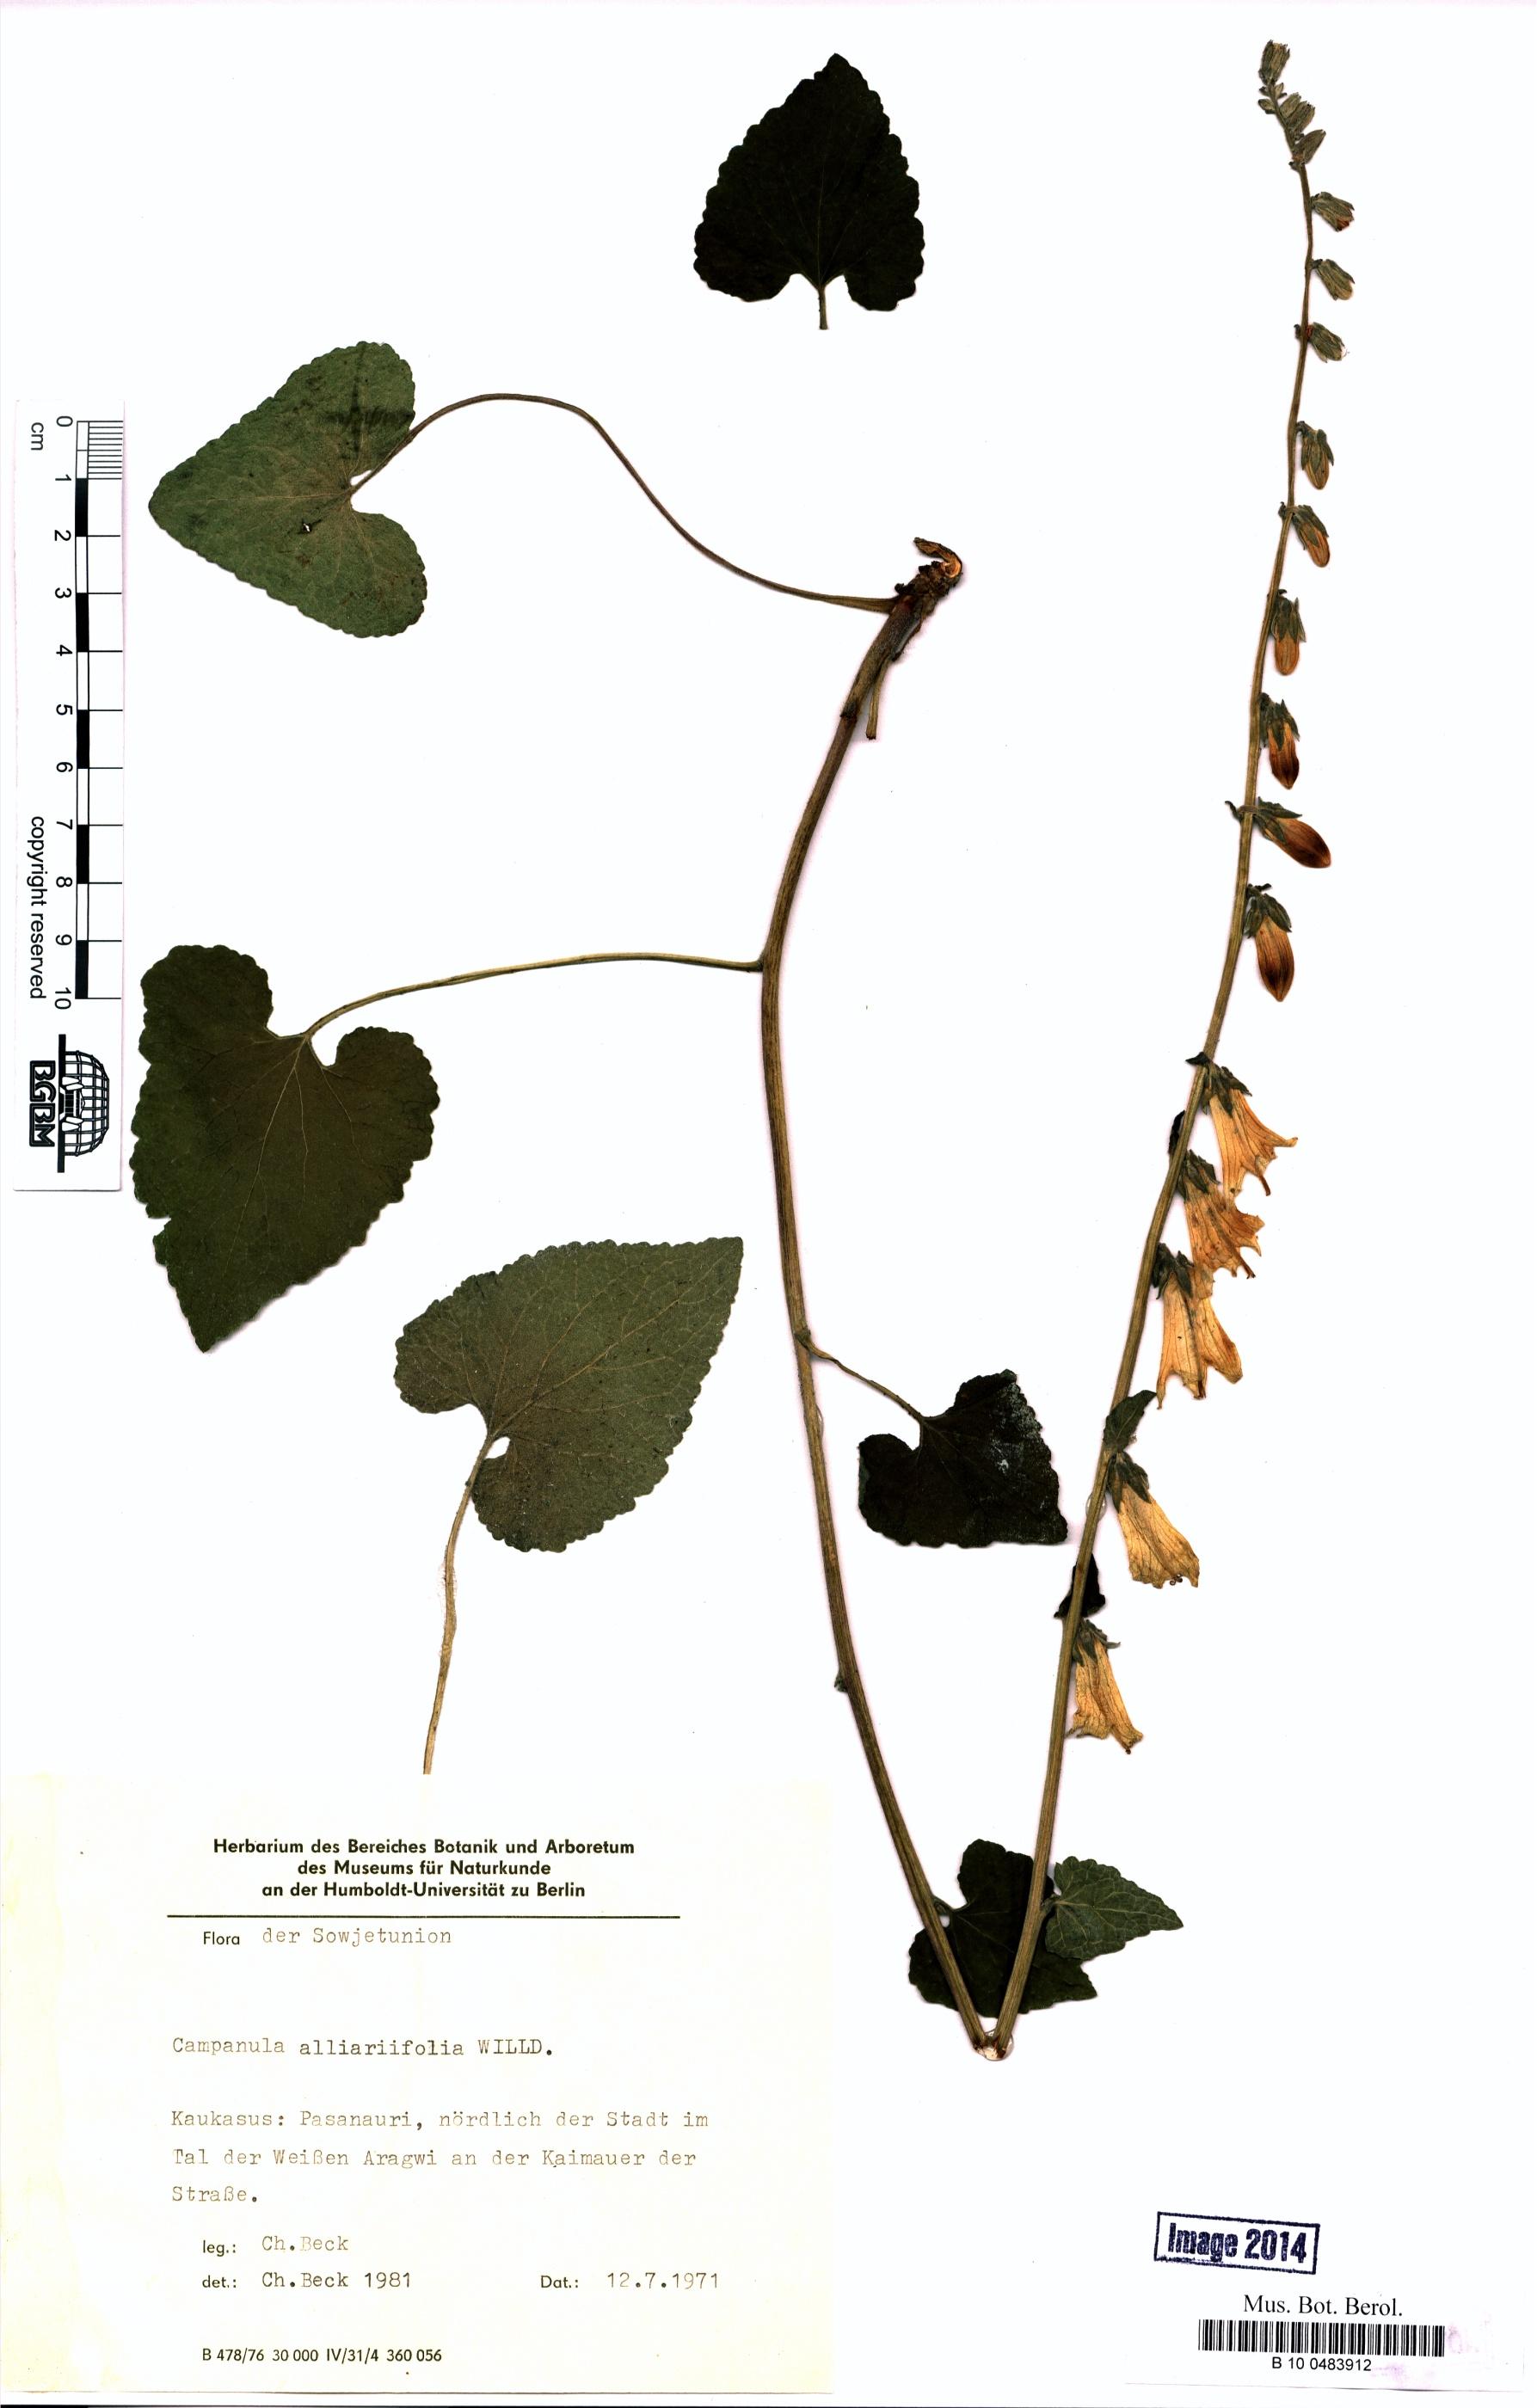 http://ww2.bgbm.org/herbarium/images/B/10/04/83/91/B_10_0483912.jpg